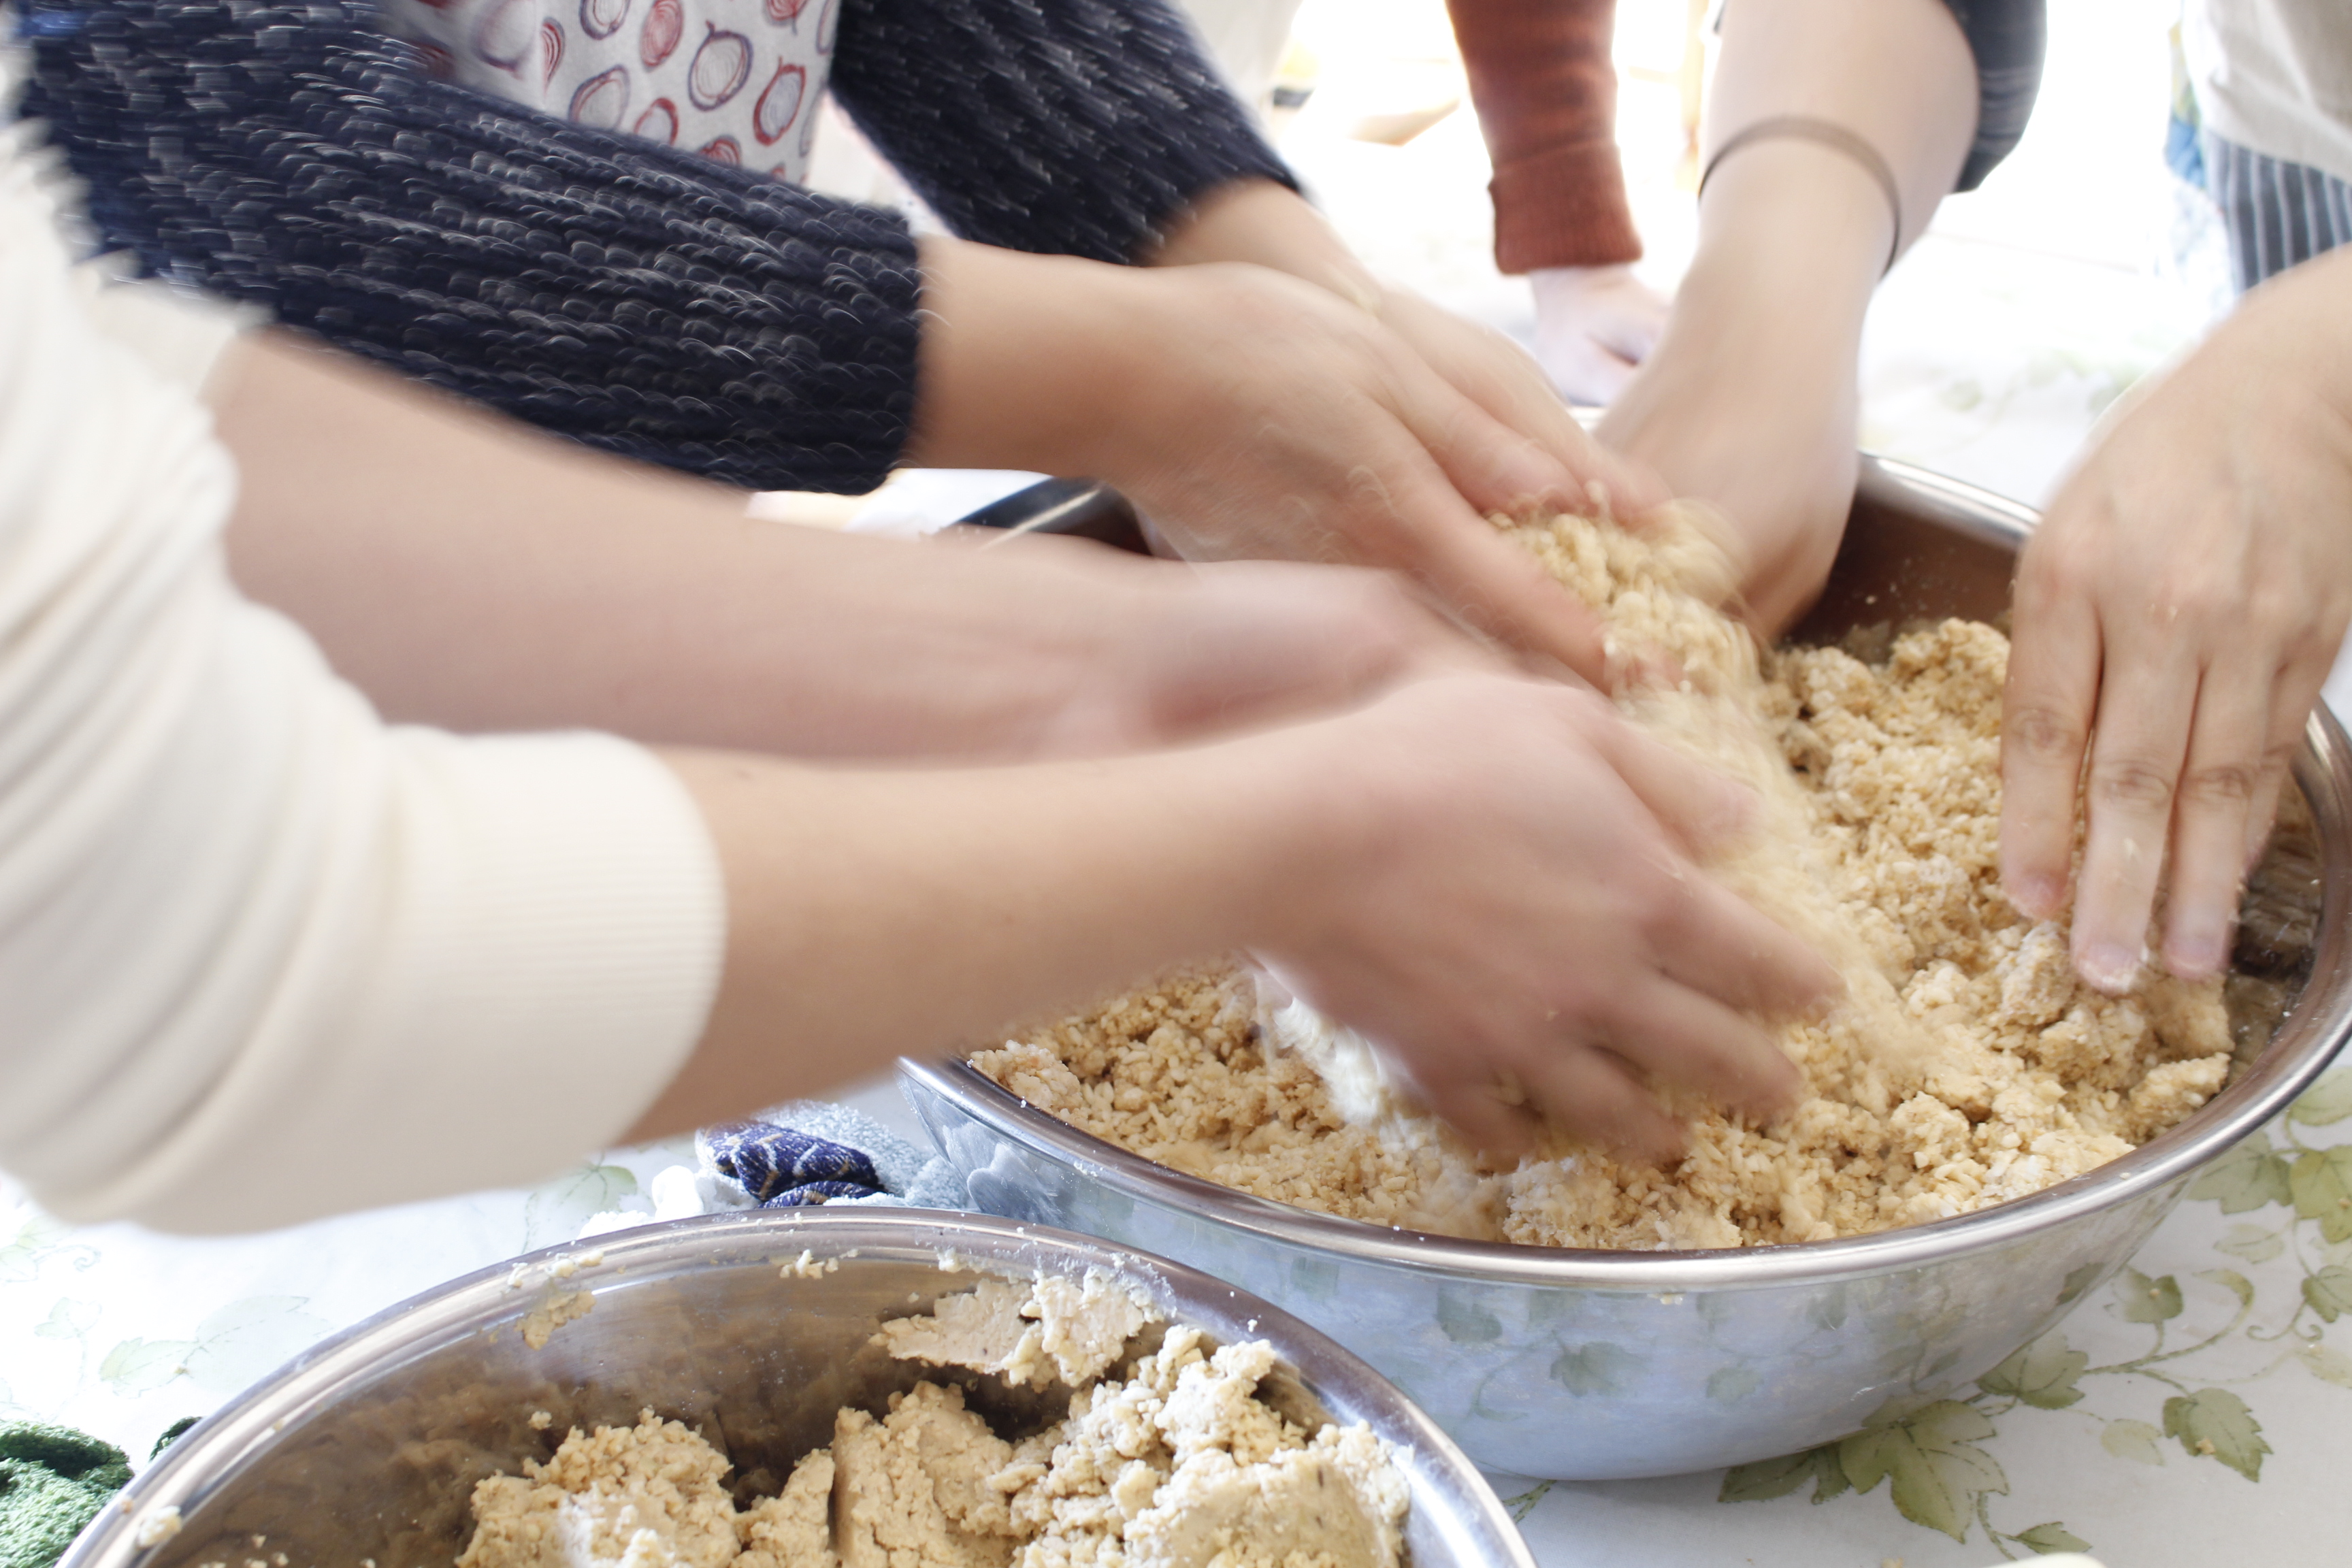 a-ta-sante糖質制限パン料理教室。阿倍野区西田辺。2017年度味噌作り開始。手作り味噌レッスン1日目。